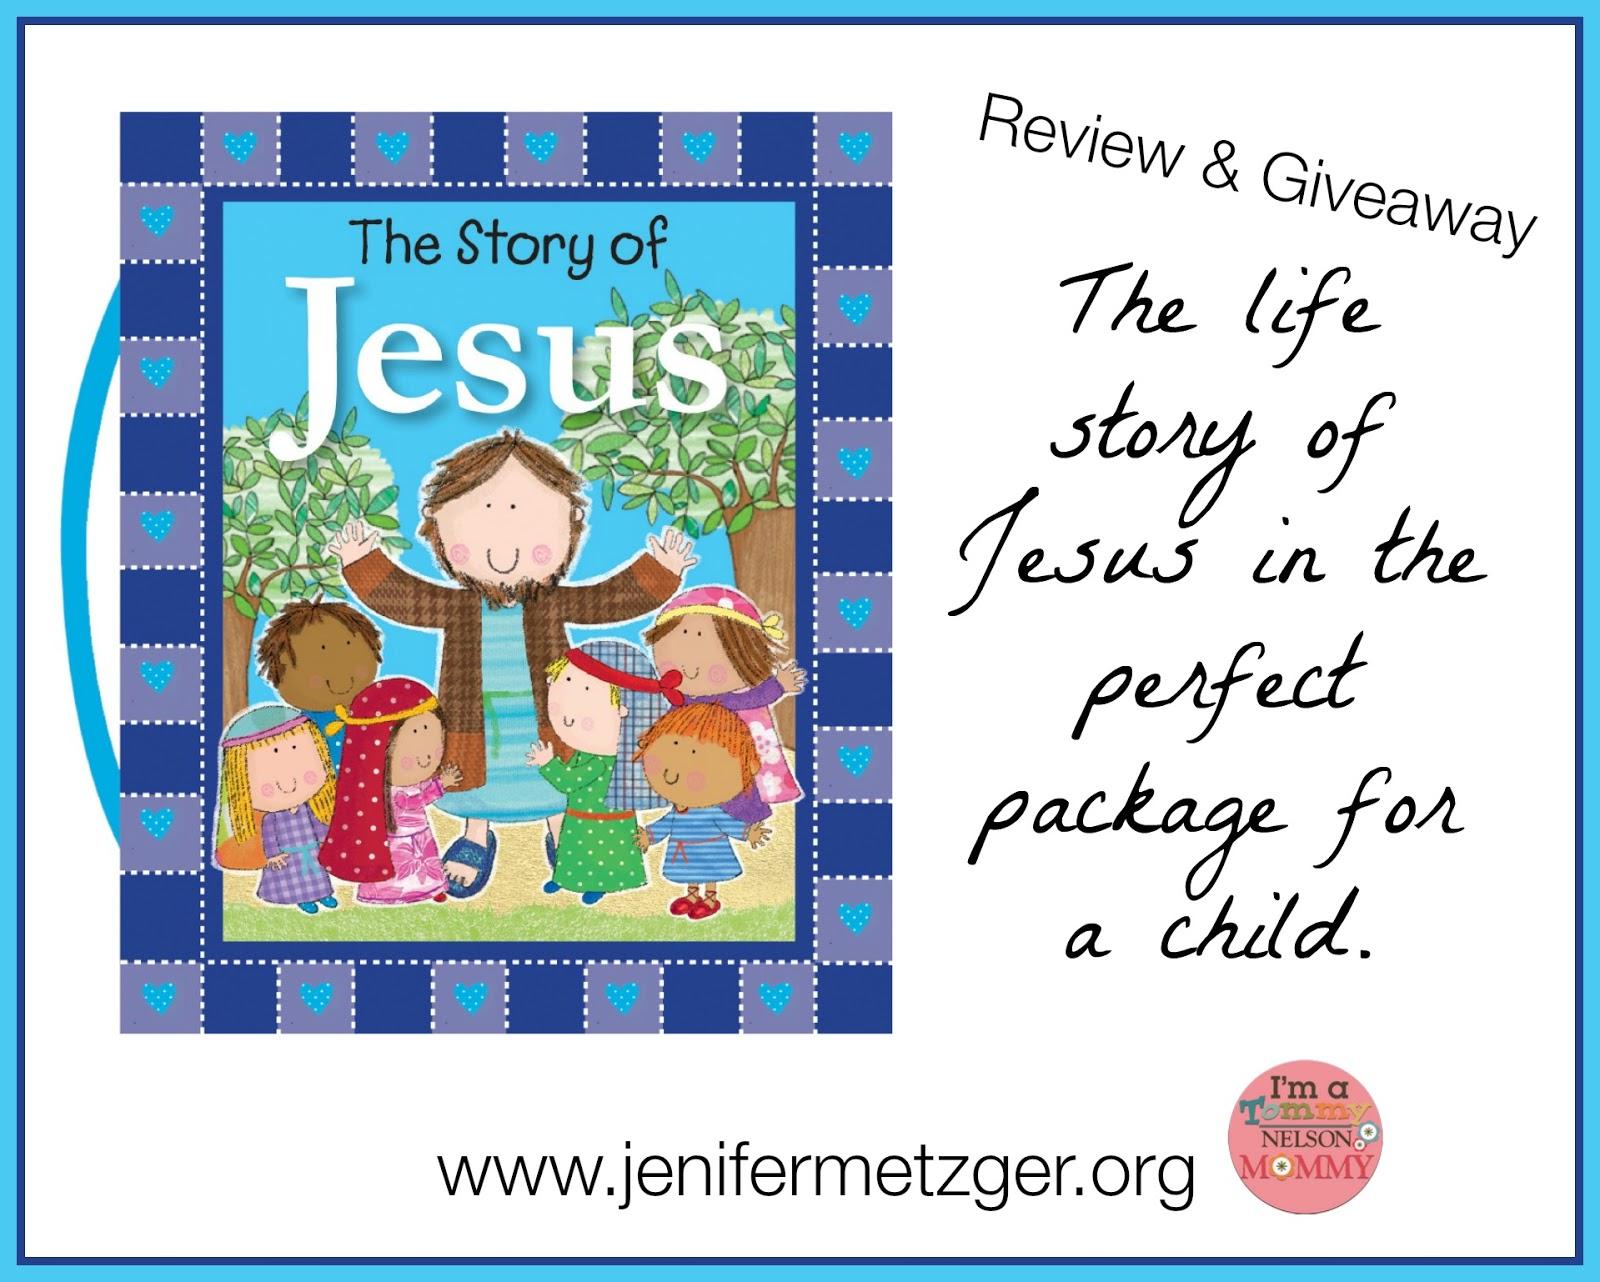 #storyofJesus #children #childrensbook #tommynelson